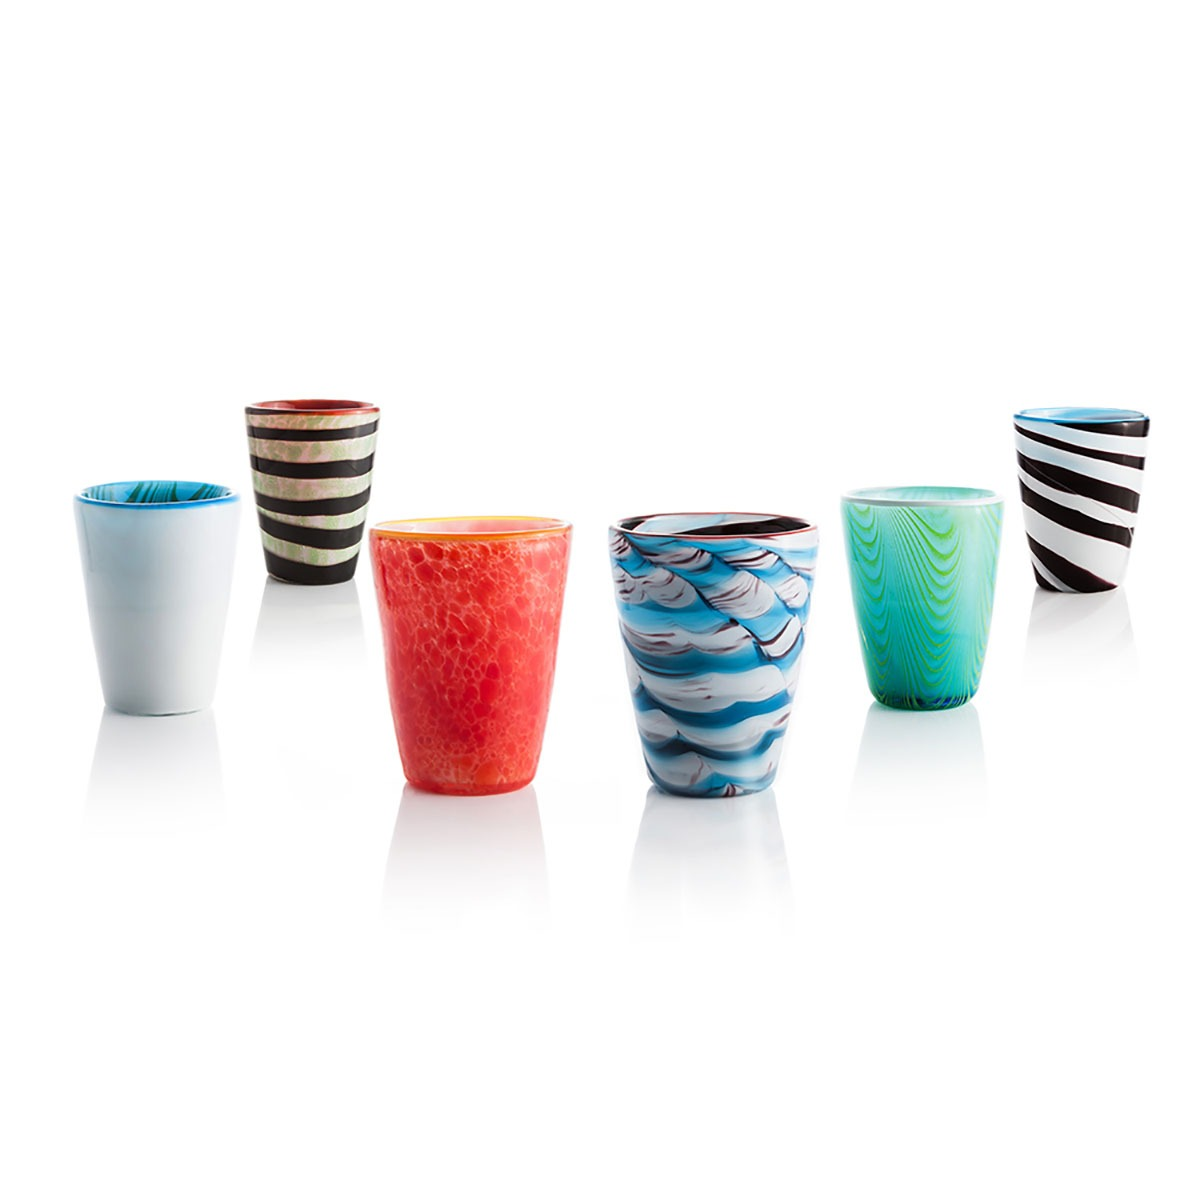 Bicchieri vetro soffiato mares italesse no noart for Bicchieri colorati vetro